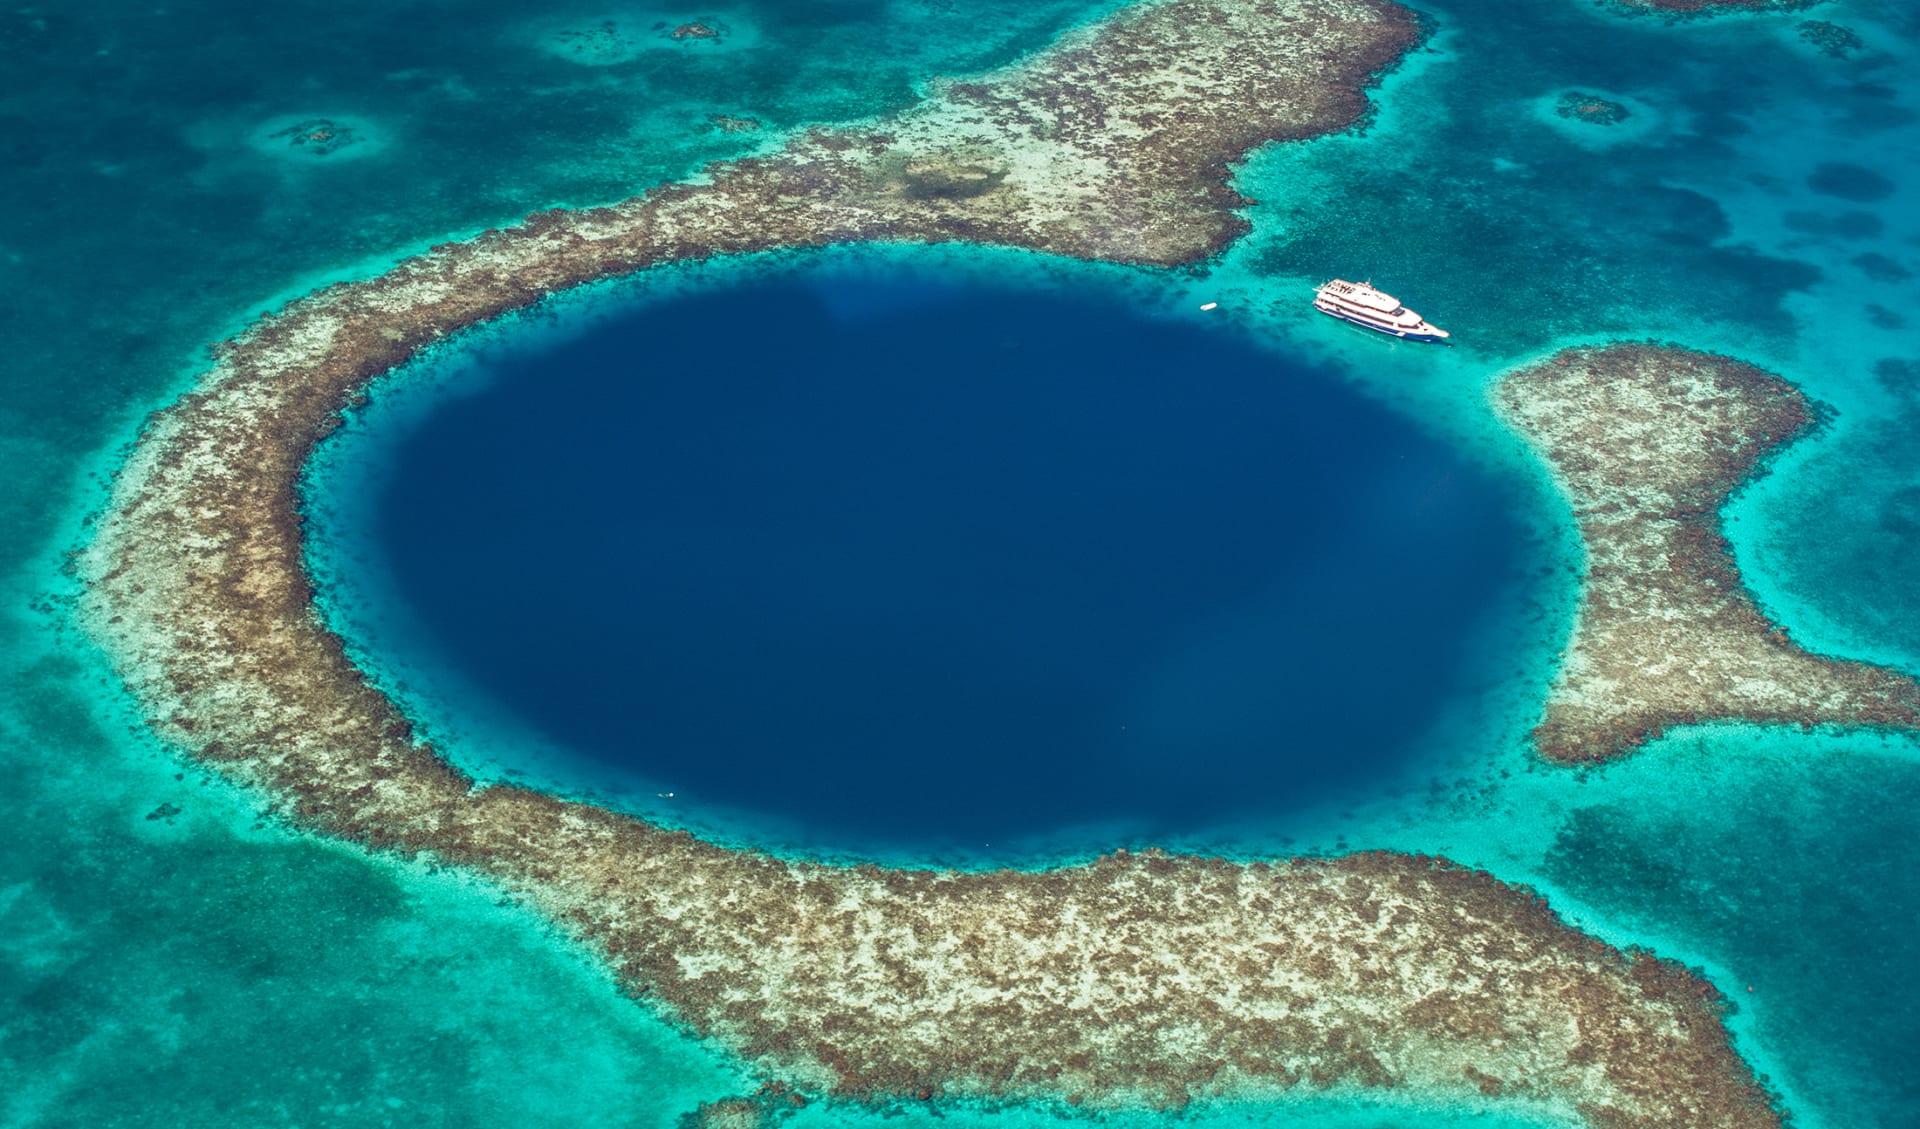 Das große blaue Loch in Belize